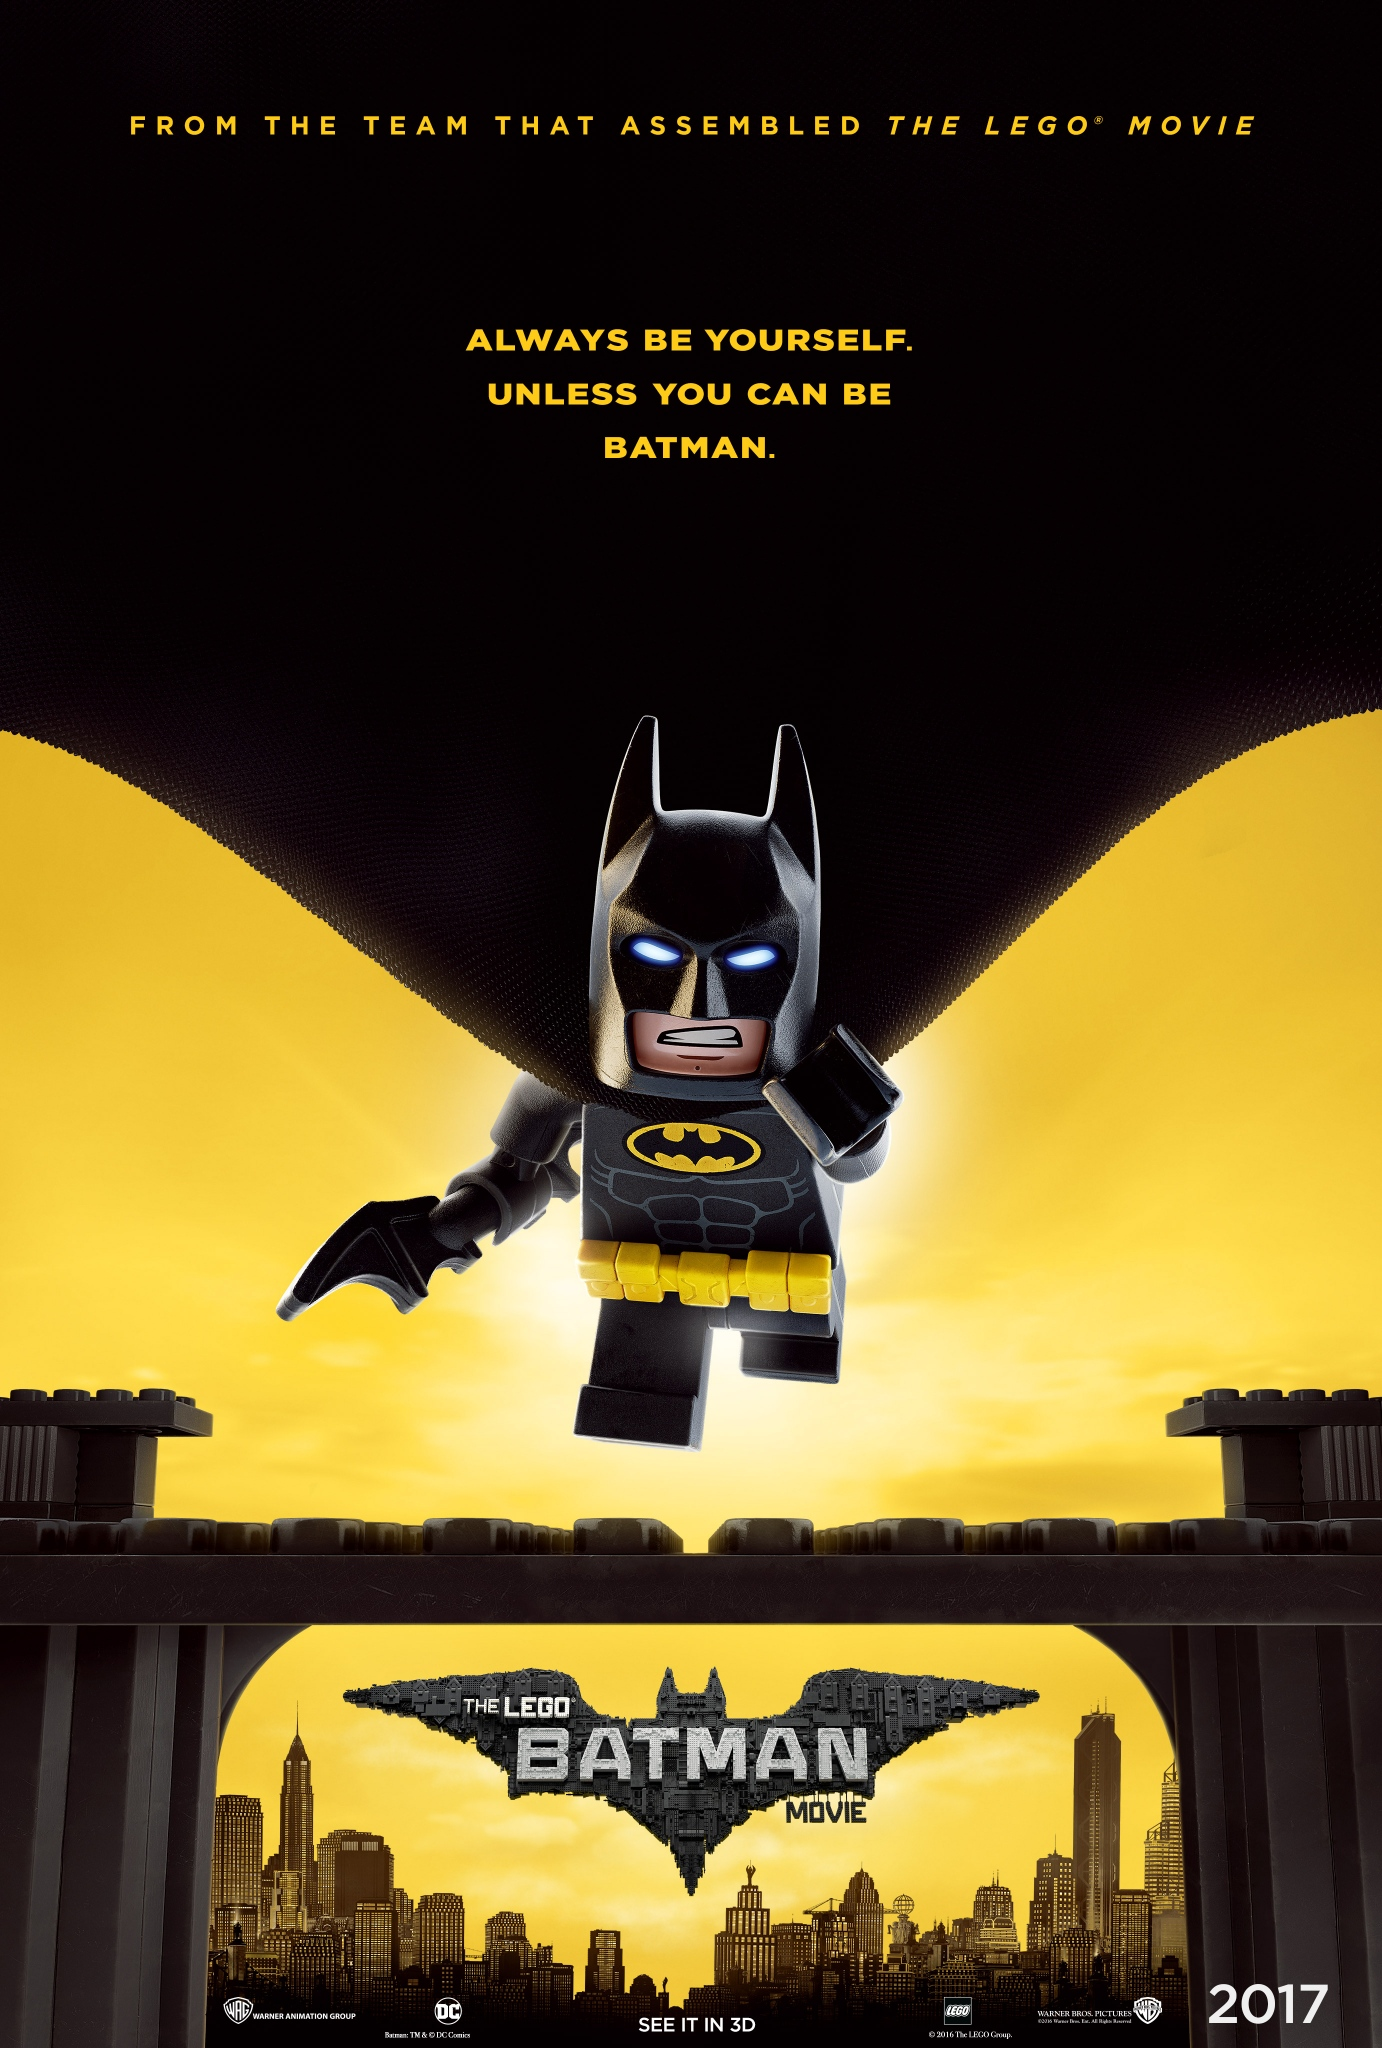 The-Lego-Batman-movie-poster.jpg